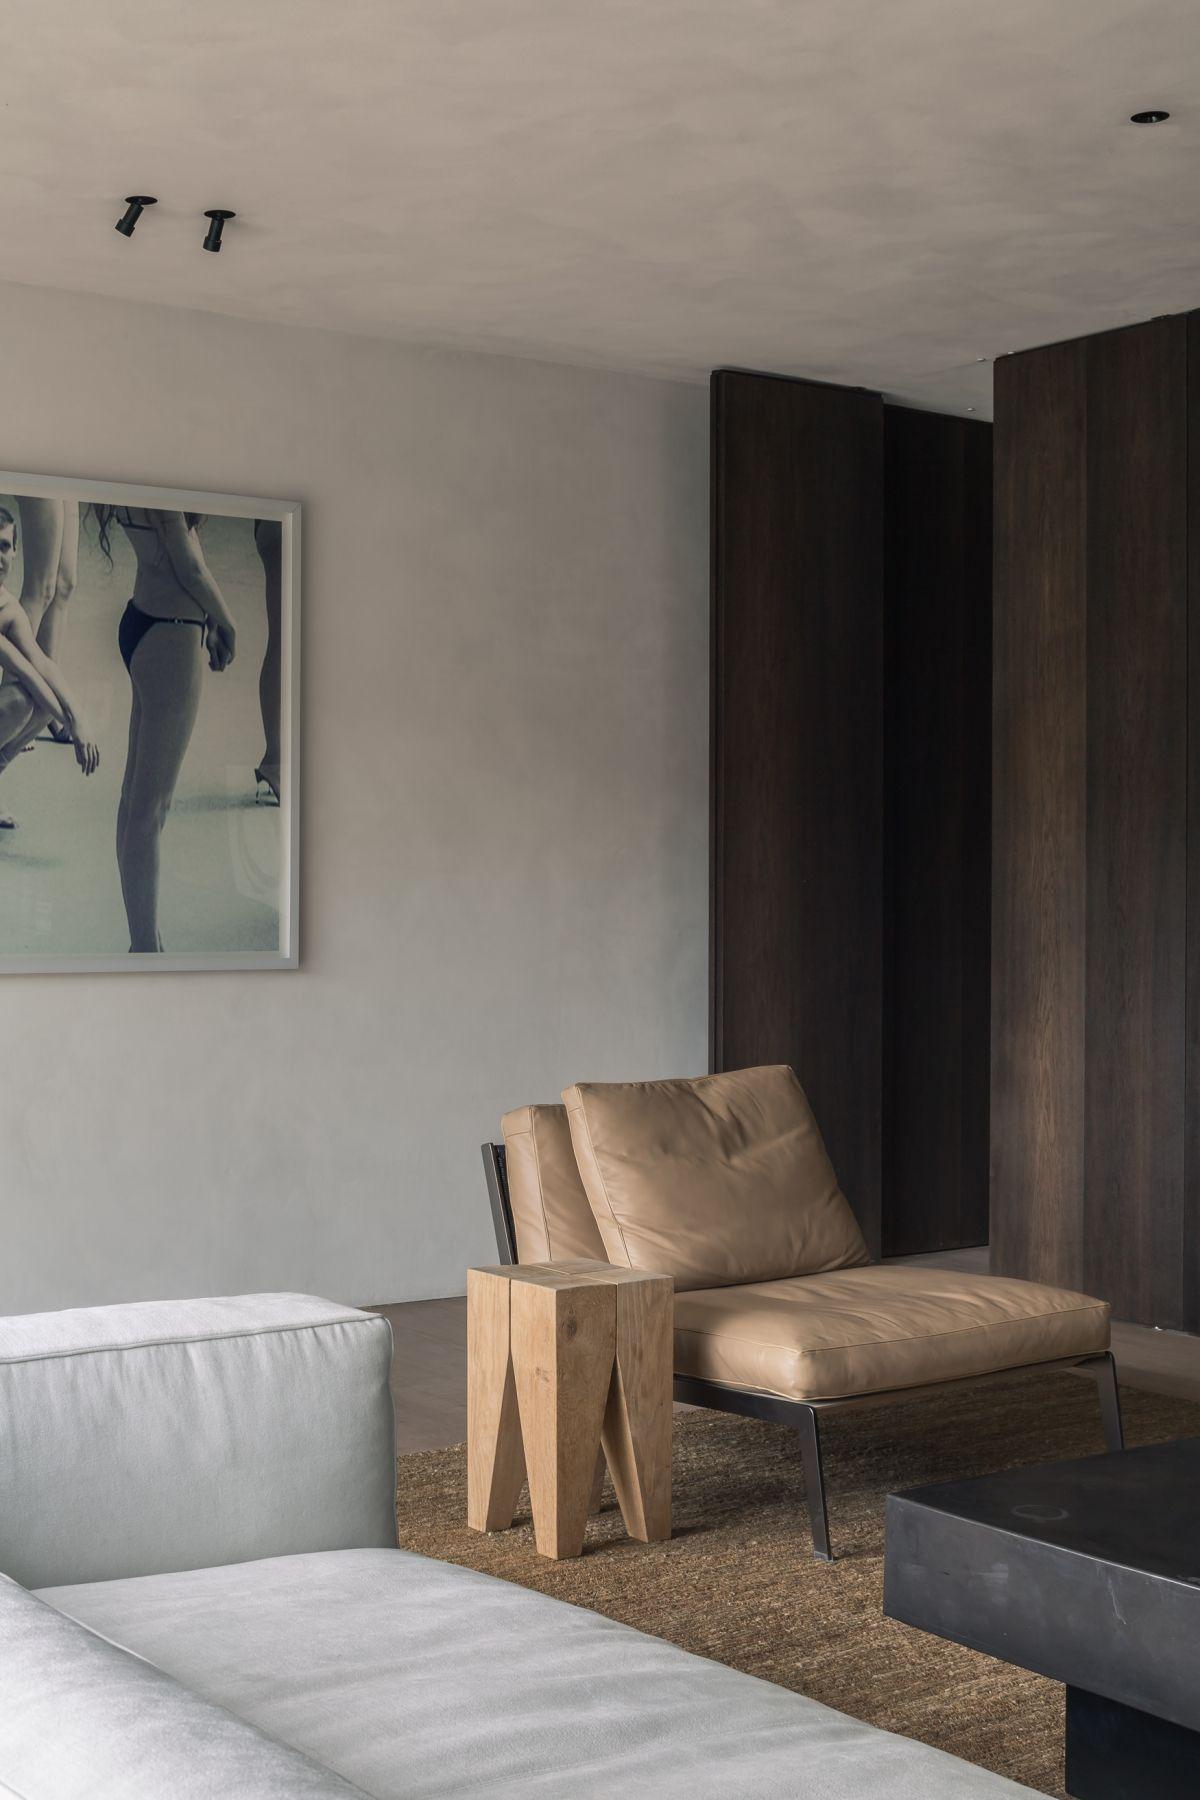 Knokke - Detail - RR Interieur | Interior Design | Pinterest ...